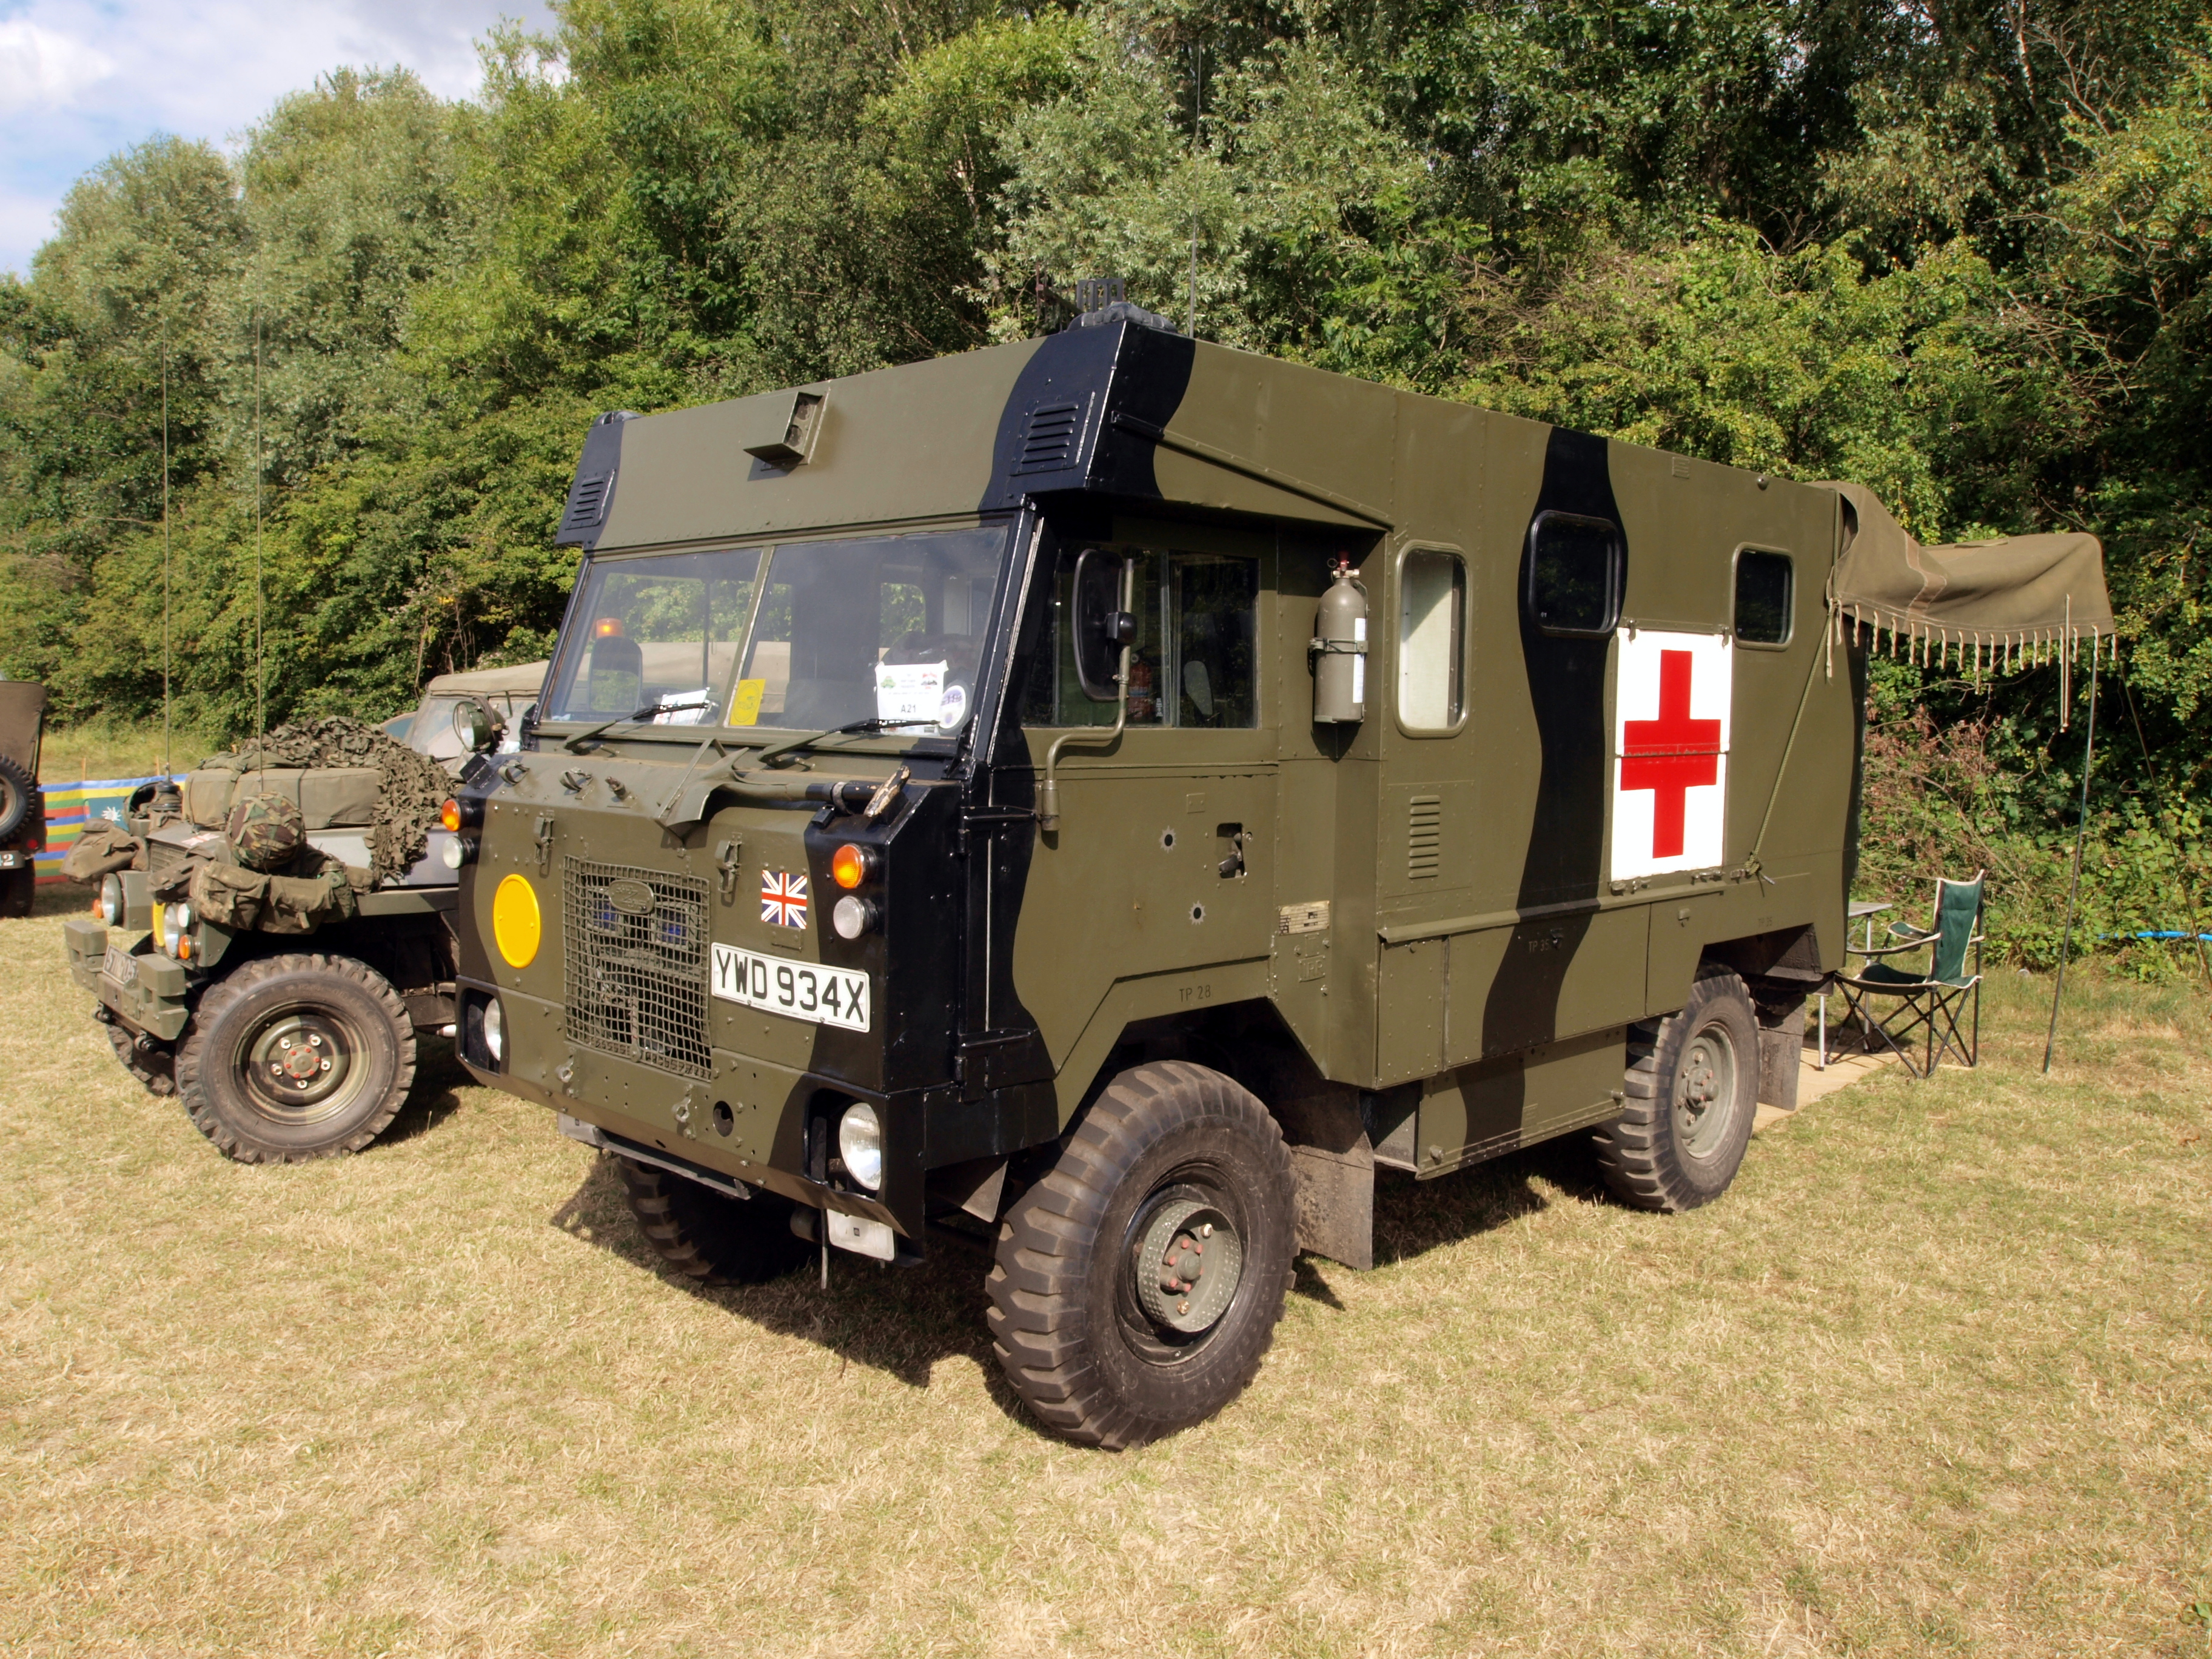 File:Land Rover 101 Forward Control Ambulance pic17.JPG - Wikimedia